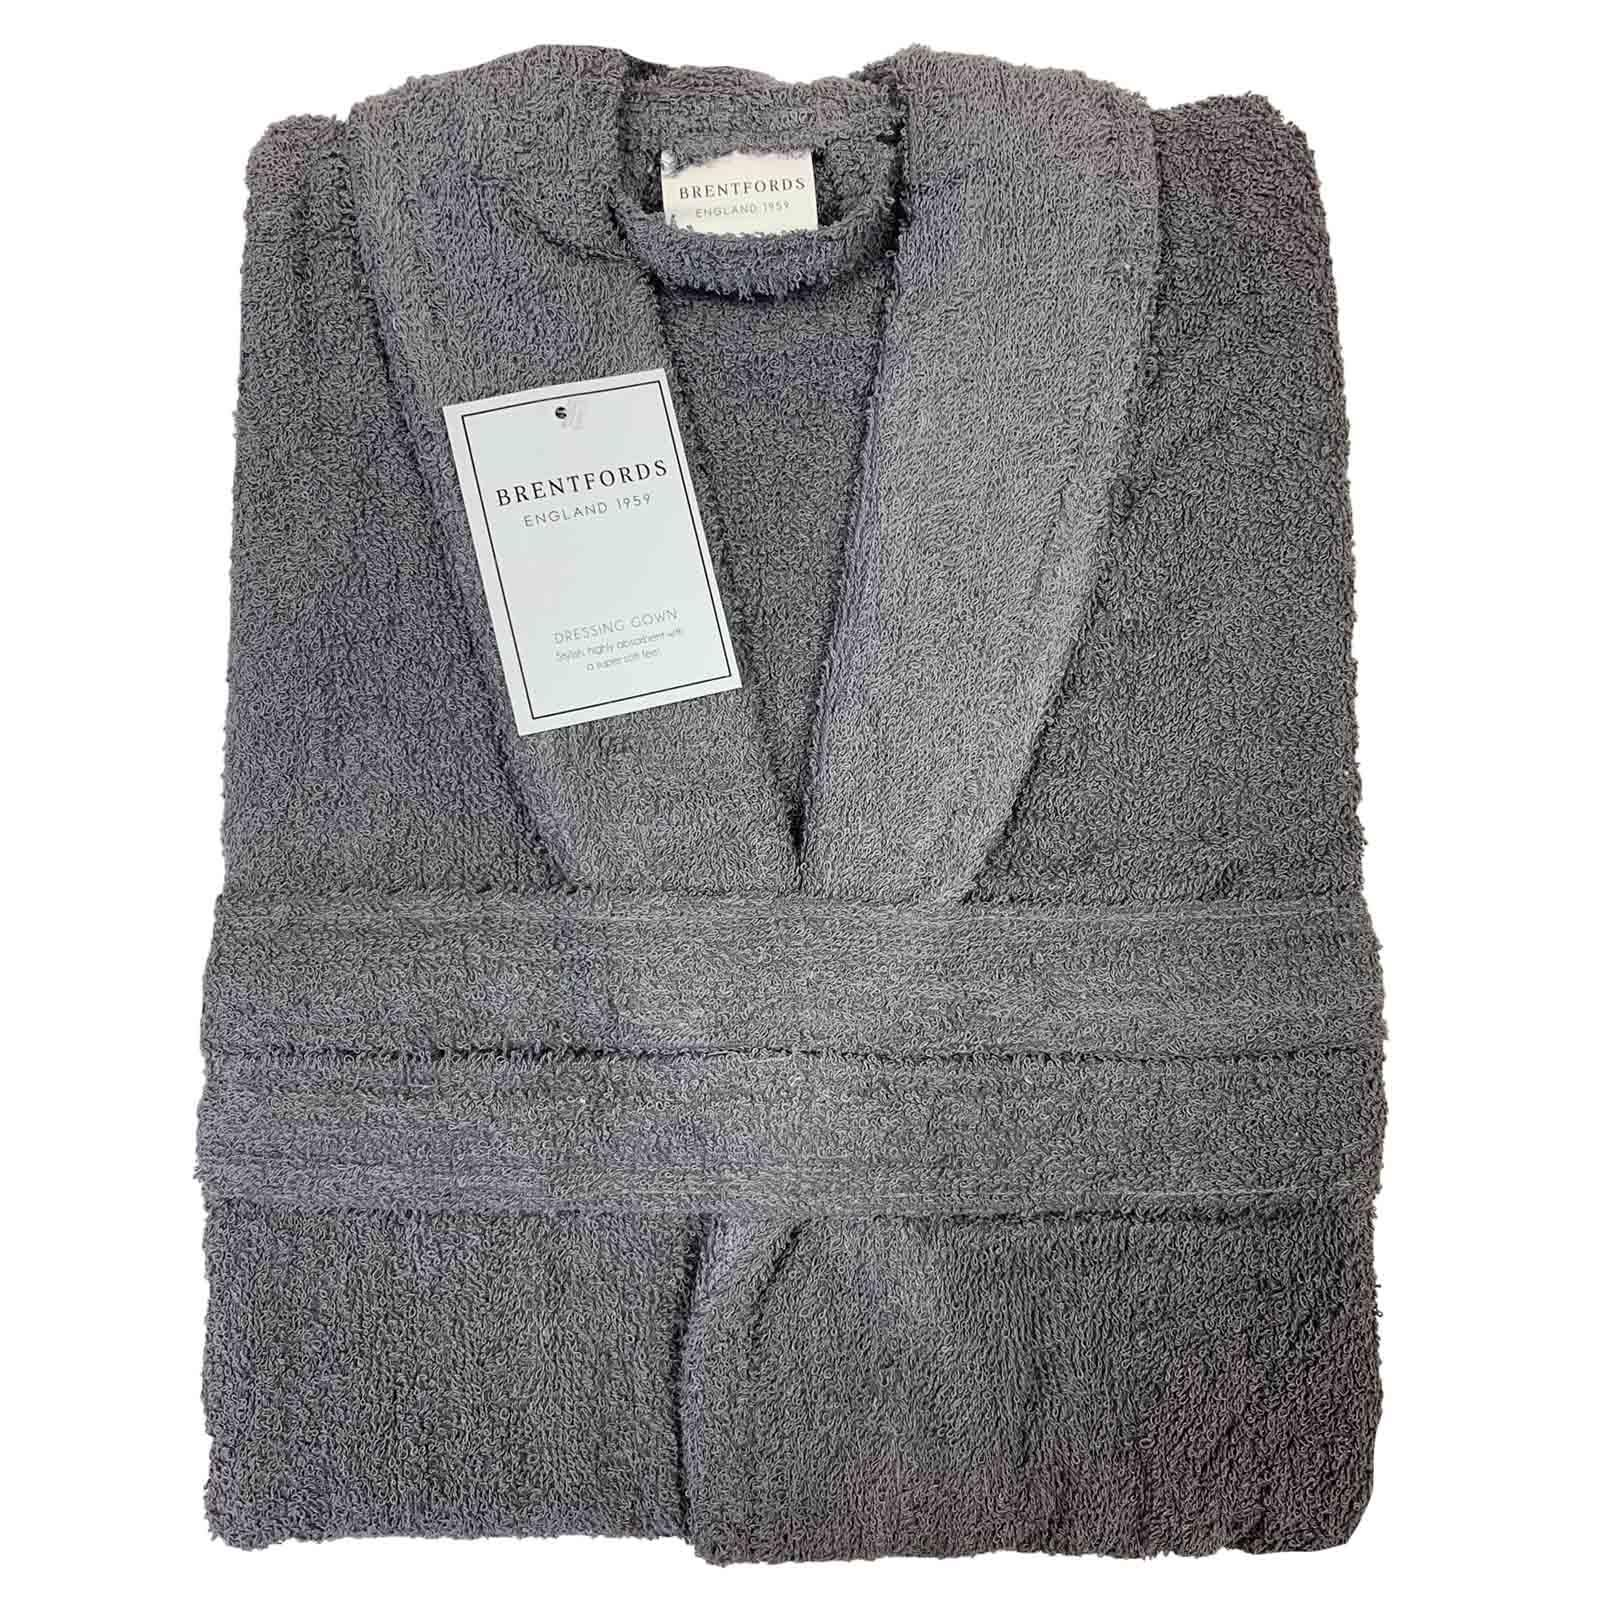 thumbnail 14 - Brentfords Luxury 100% Cotton Bath Robe Terry Towel Soft Dressing Gown Unisex